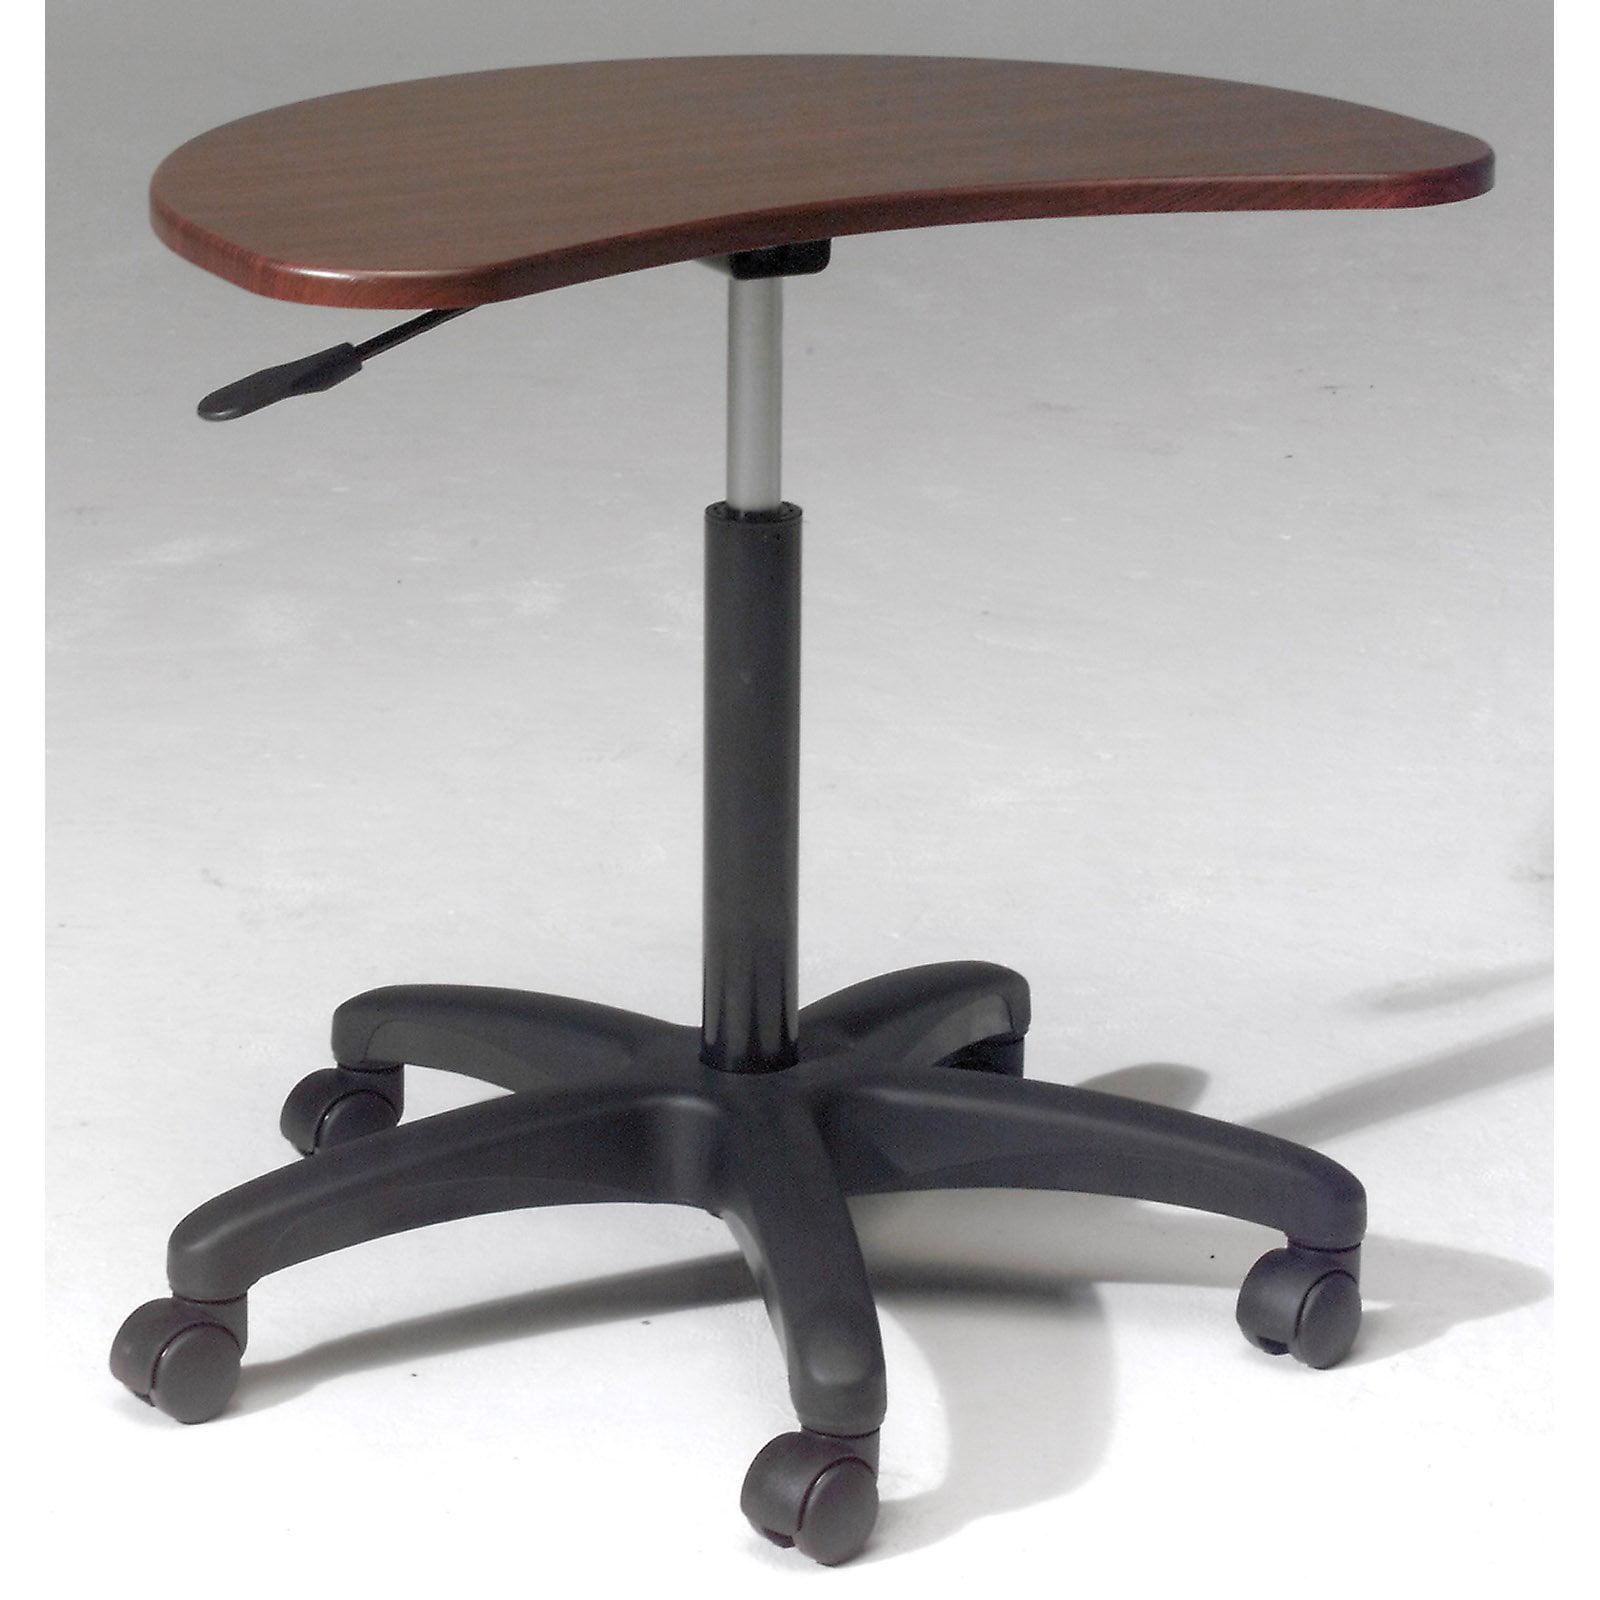 Balt POP Adjustable Height Laptop Stand